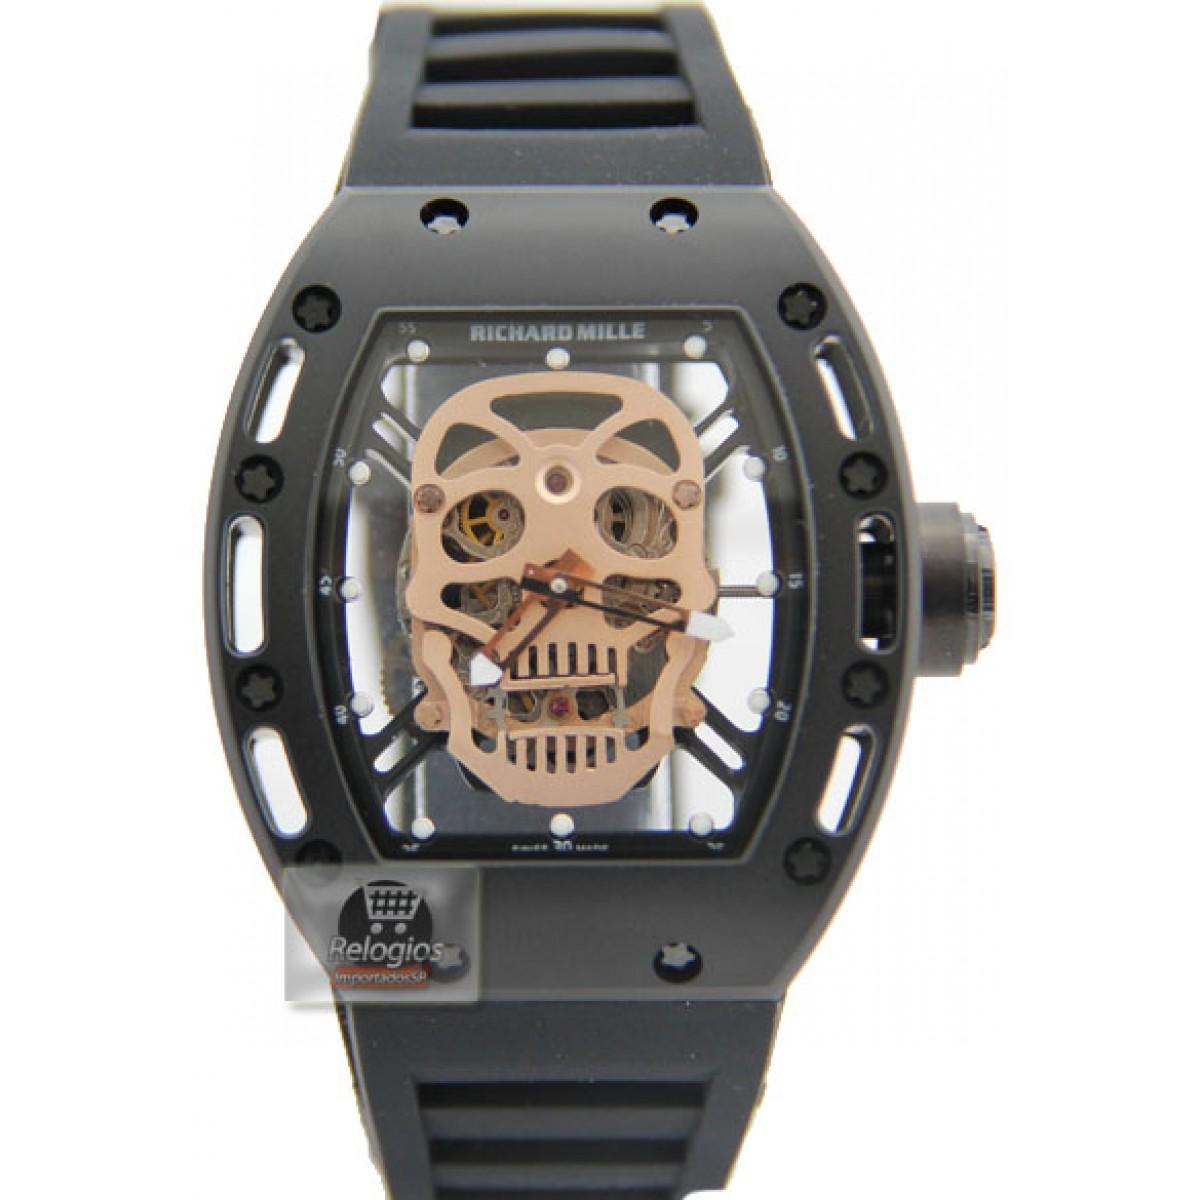 98ab118bd29 Relógio Richard Mille Edition Limted Caveira Black